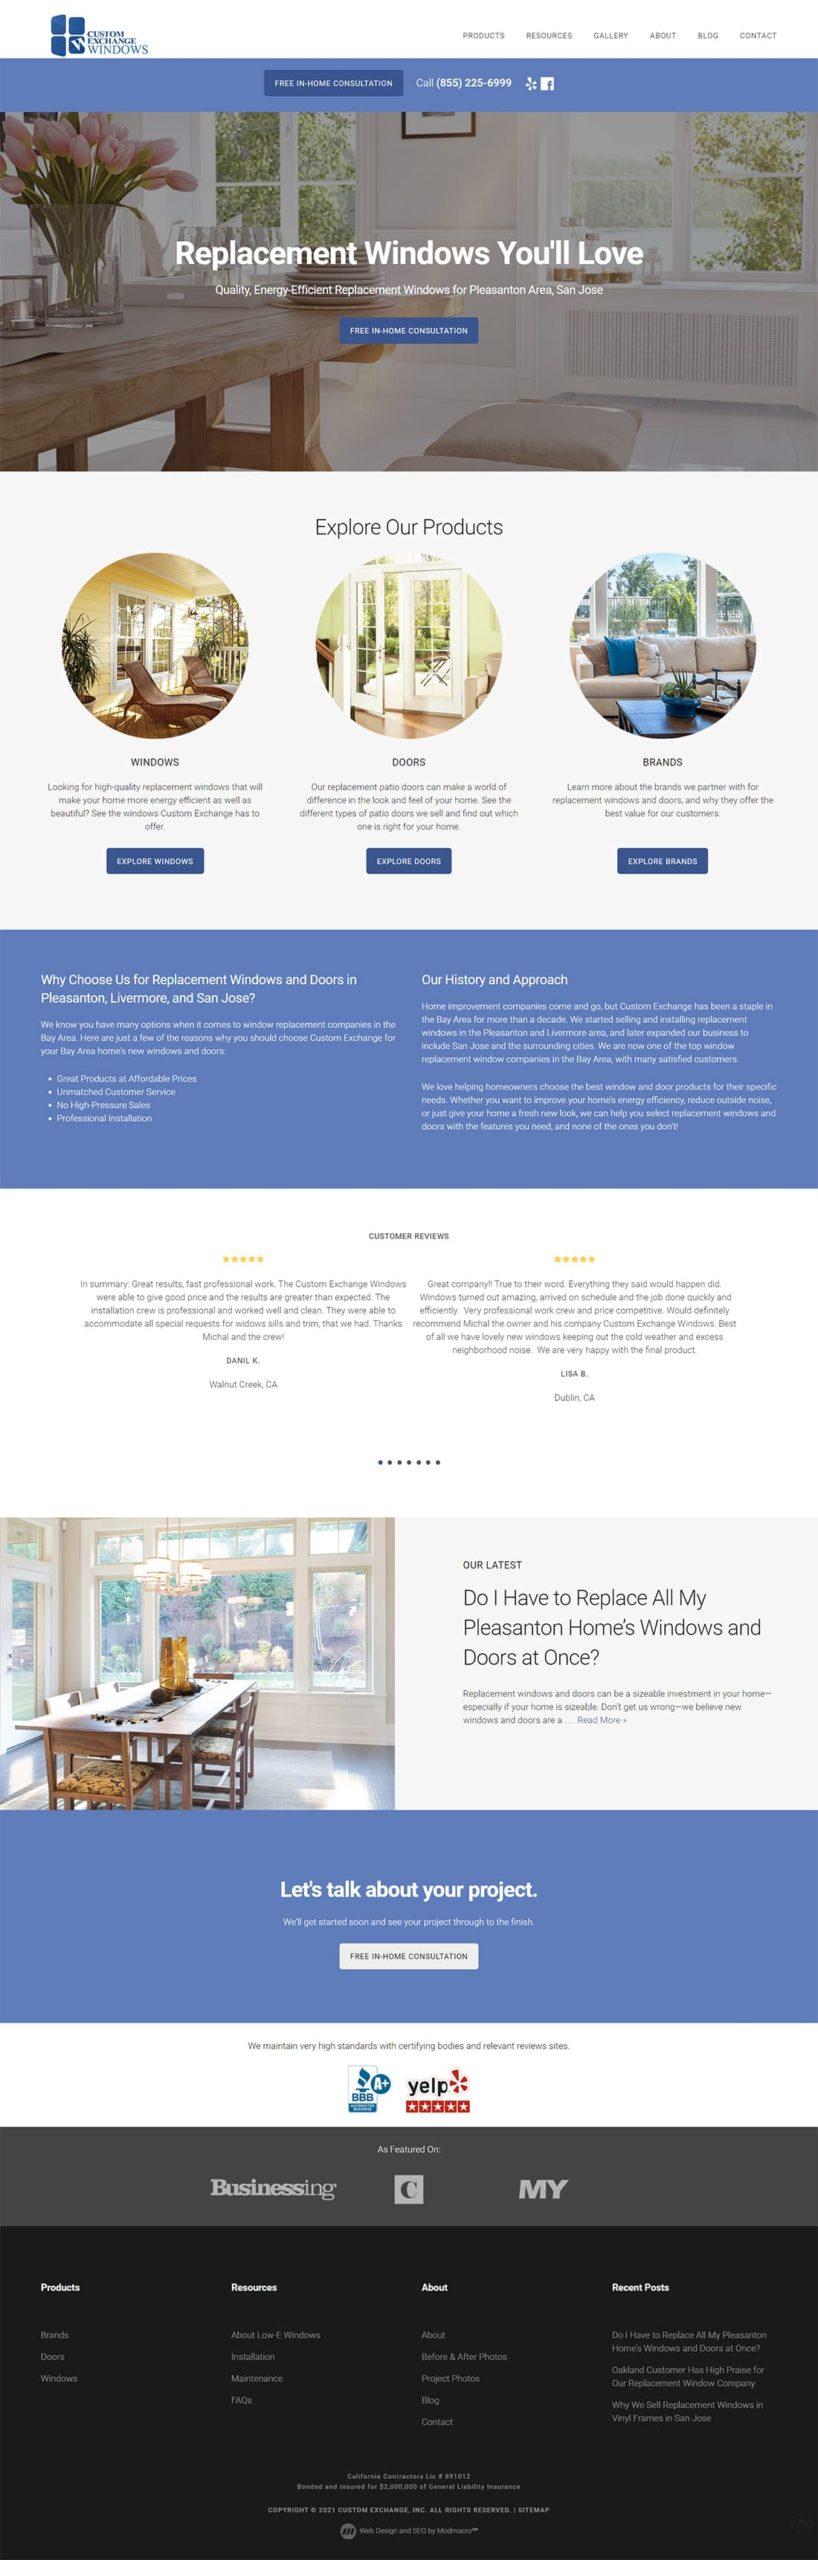 pleasanton, ca web design